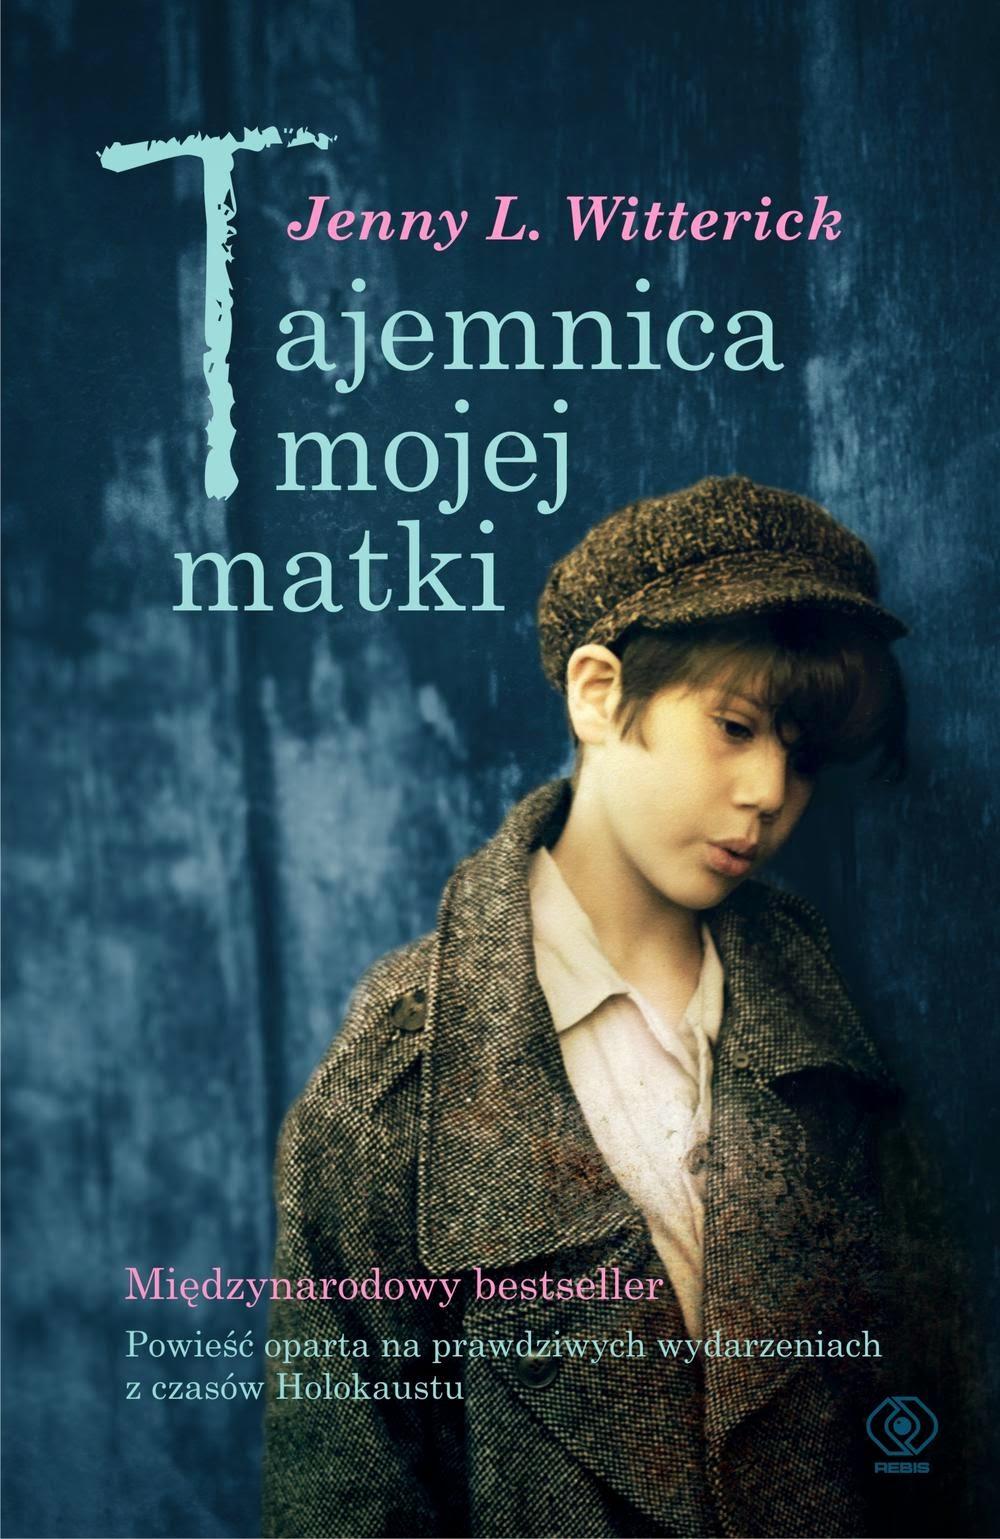 http://www.inbook.pl/product/show/661624/ksiazka-tajemnica-mojej-matki-witterick-jenny-l-ksiazki-literatura-piekna-powiesci